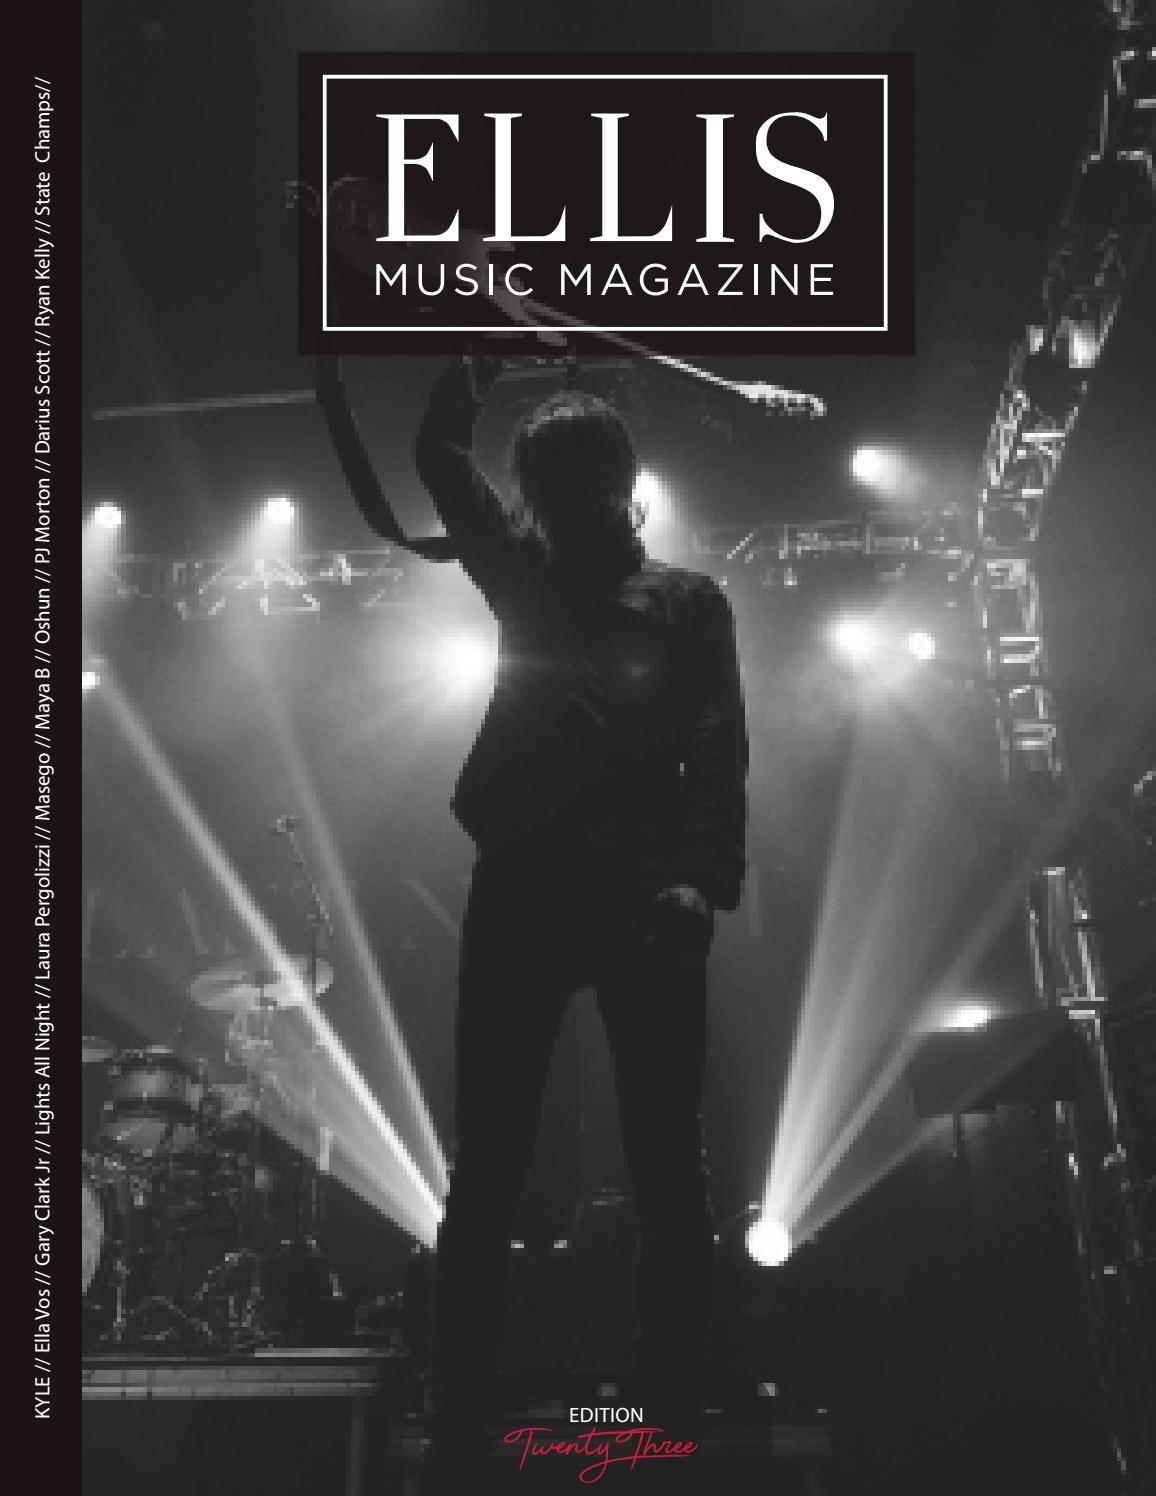 Ellis Music Magazine Issue 23 by Ellis Music Magazine - issuu